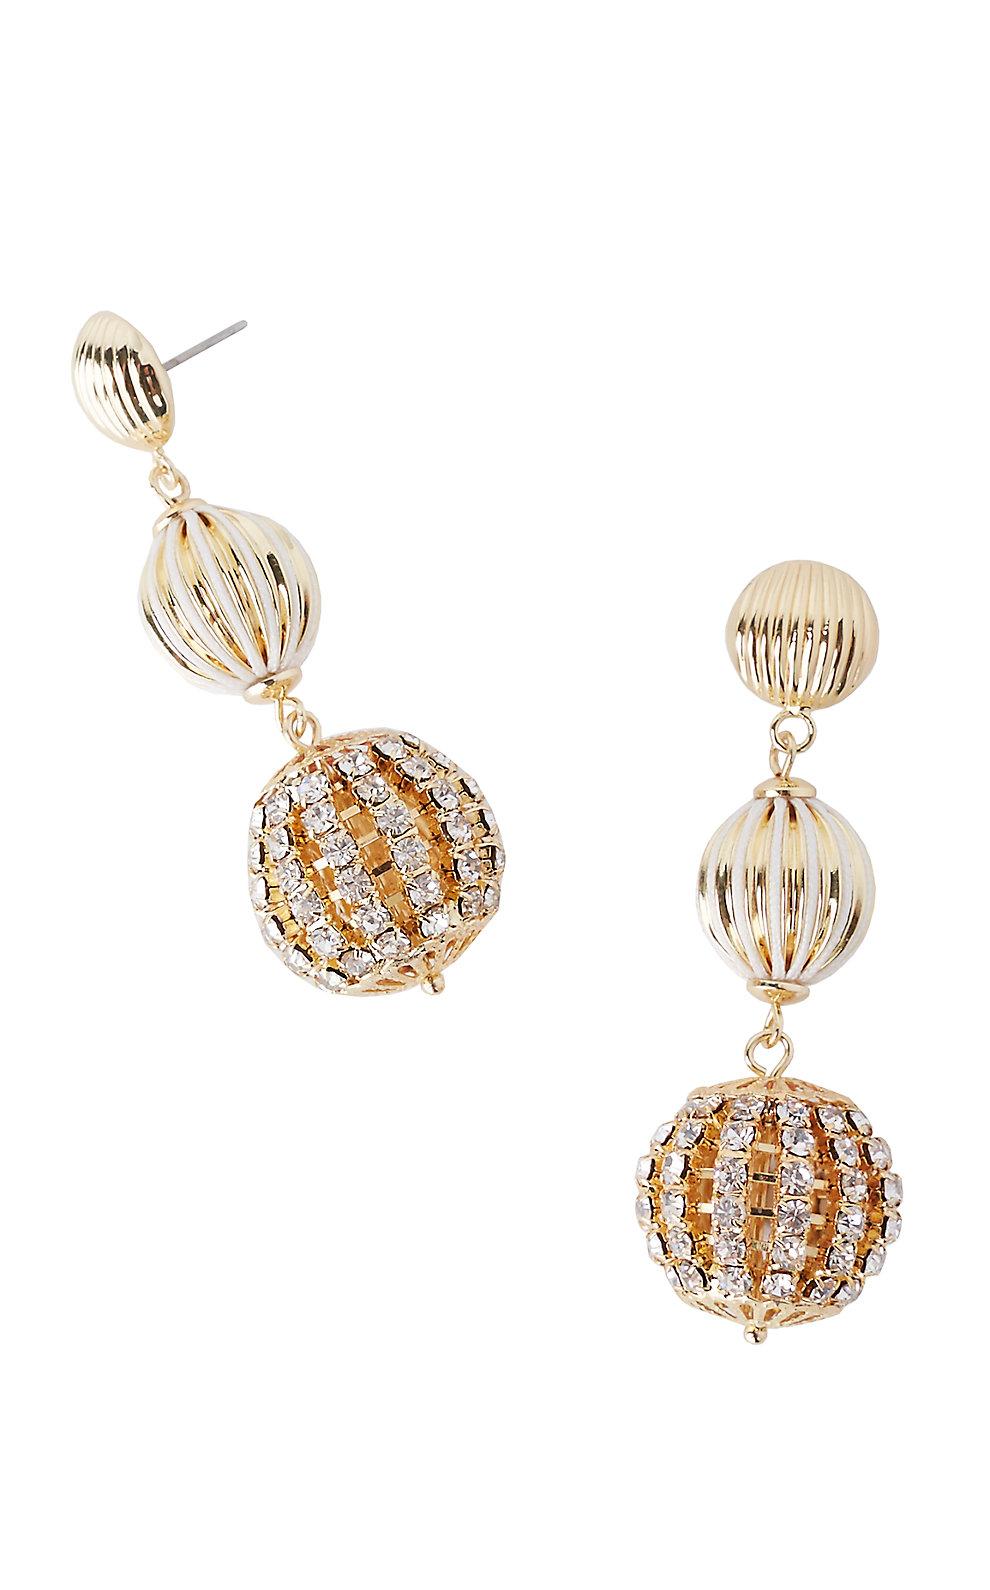 Lilly Pulitzer Starburst Drop Earrings